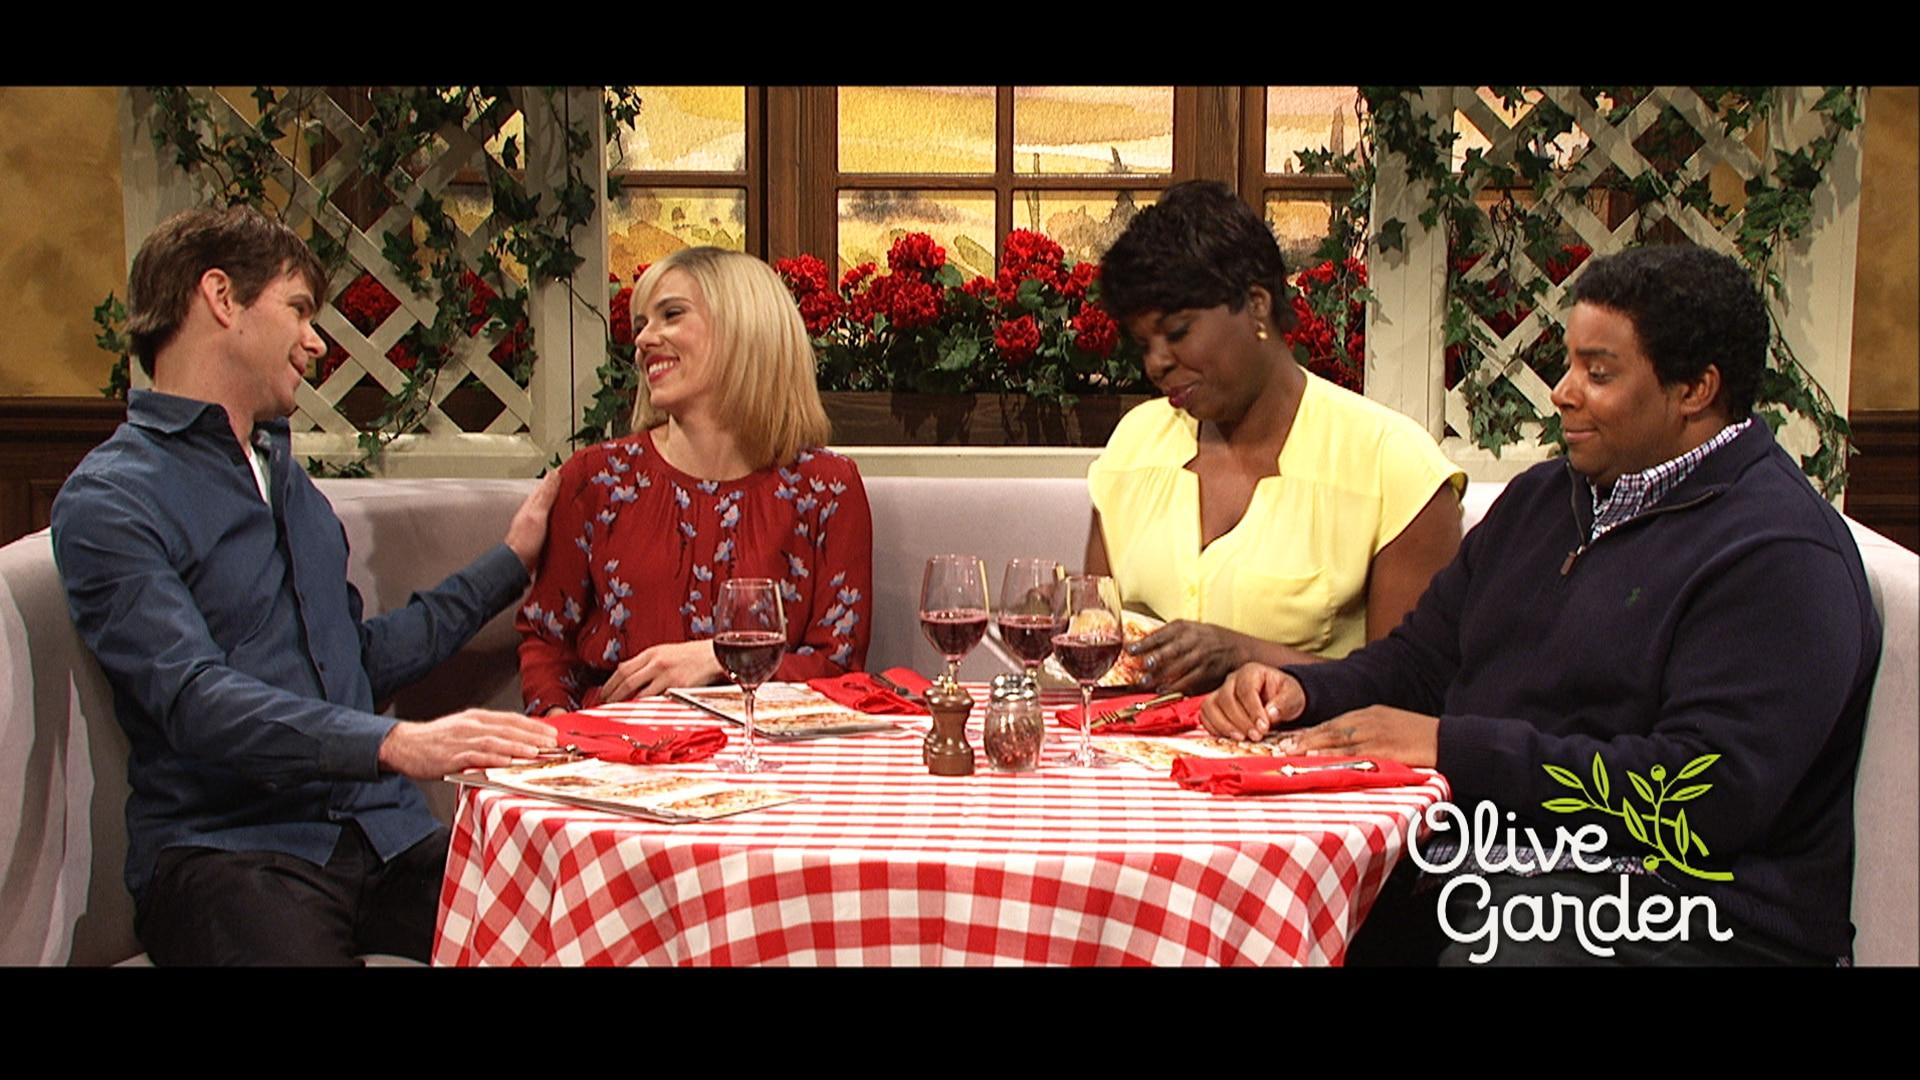 watch saturday night live highlight olive garden nbccom - Olive Garden Christmas Hours